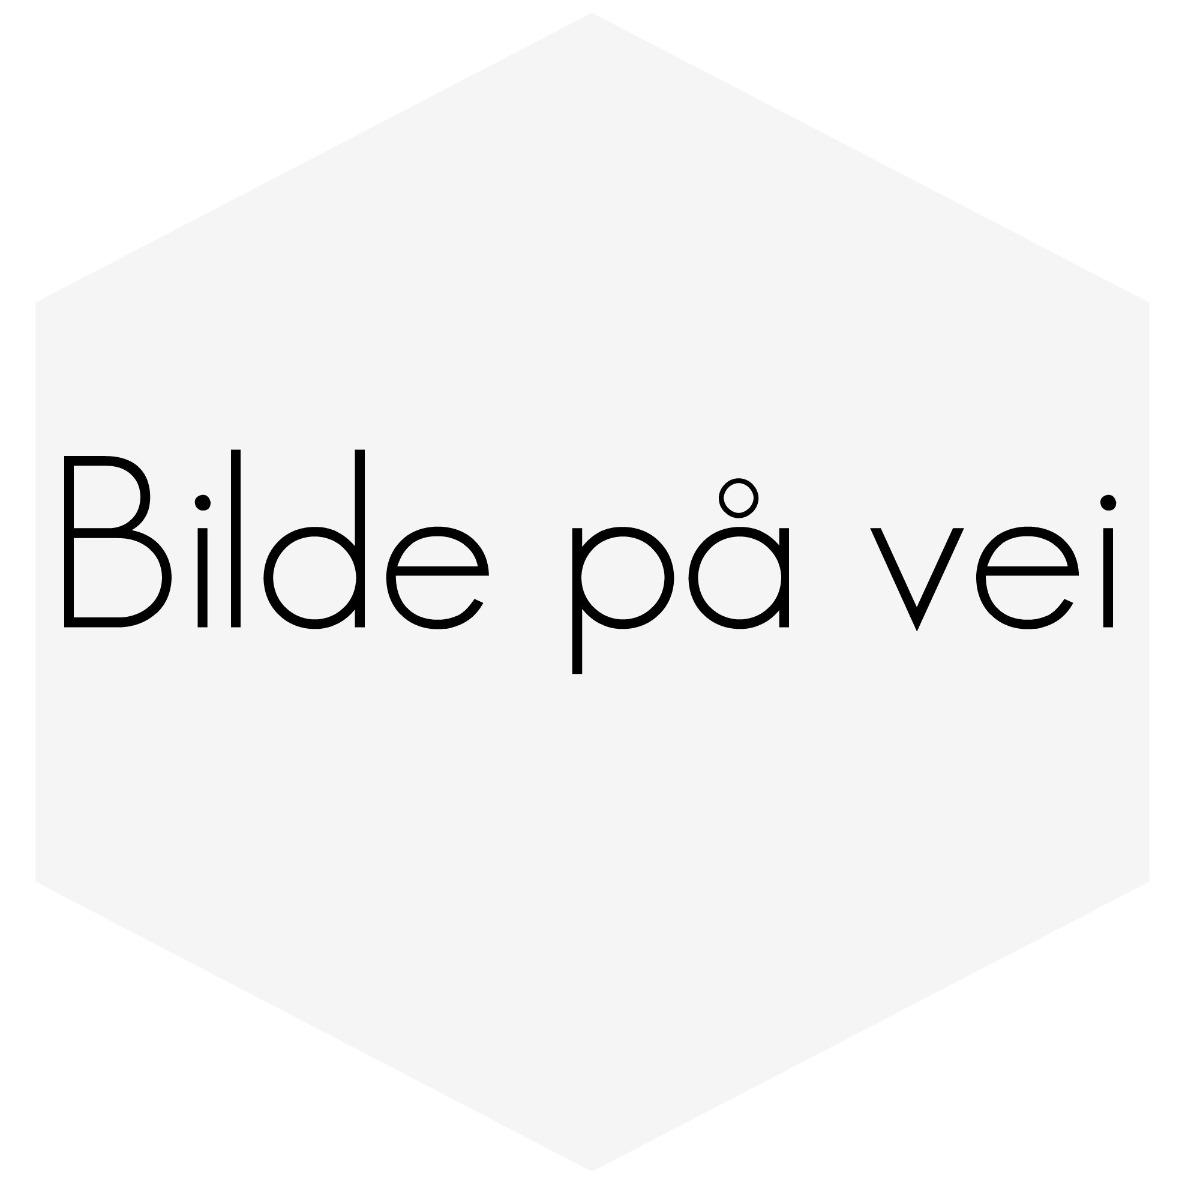 "SILIKONSLANGE RØD REDUSERING 1,5-1,75"" (38-45MM)"